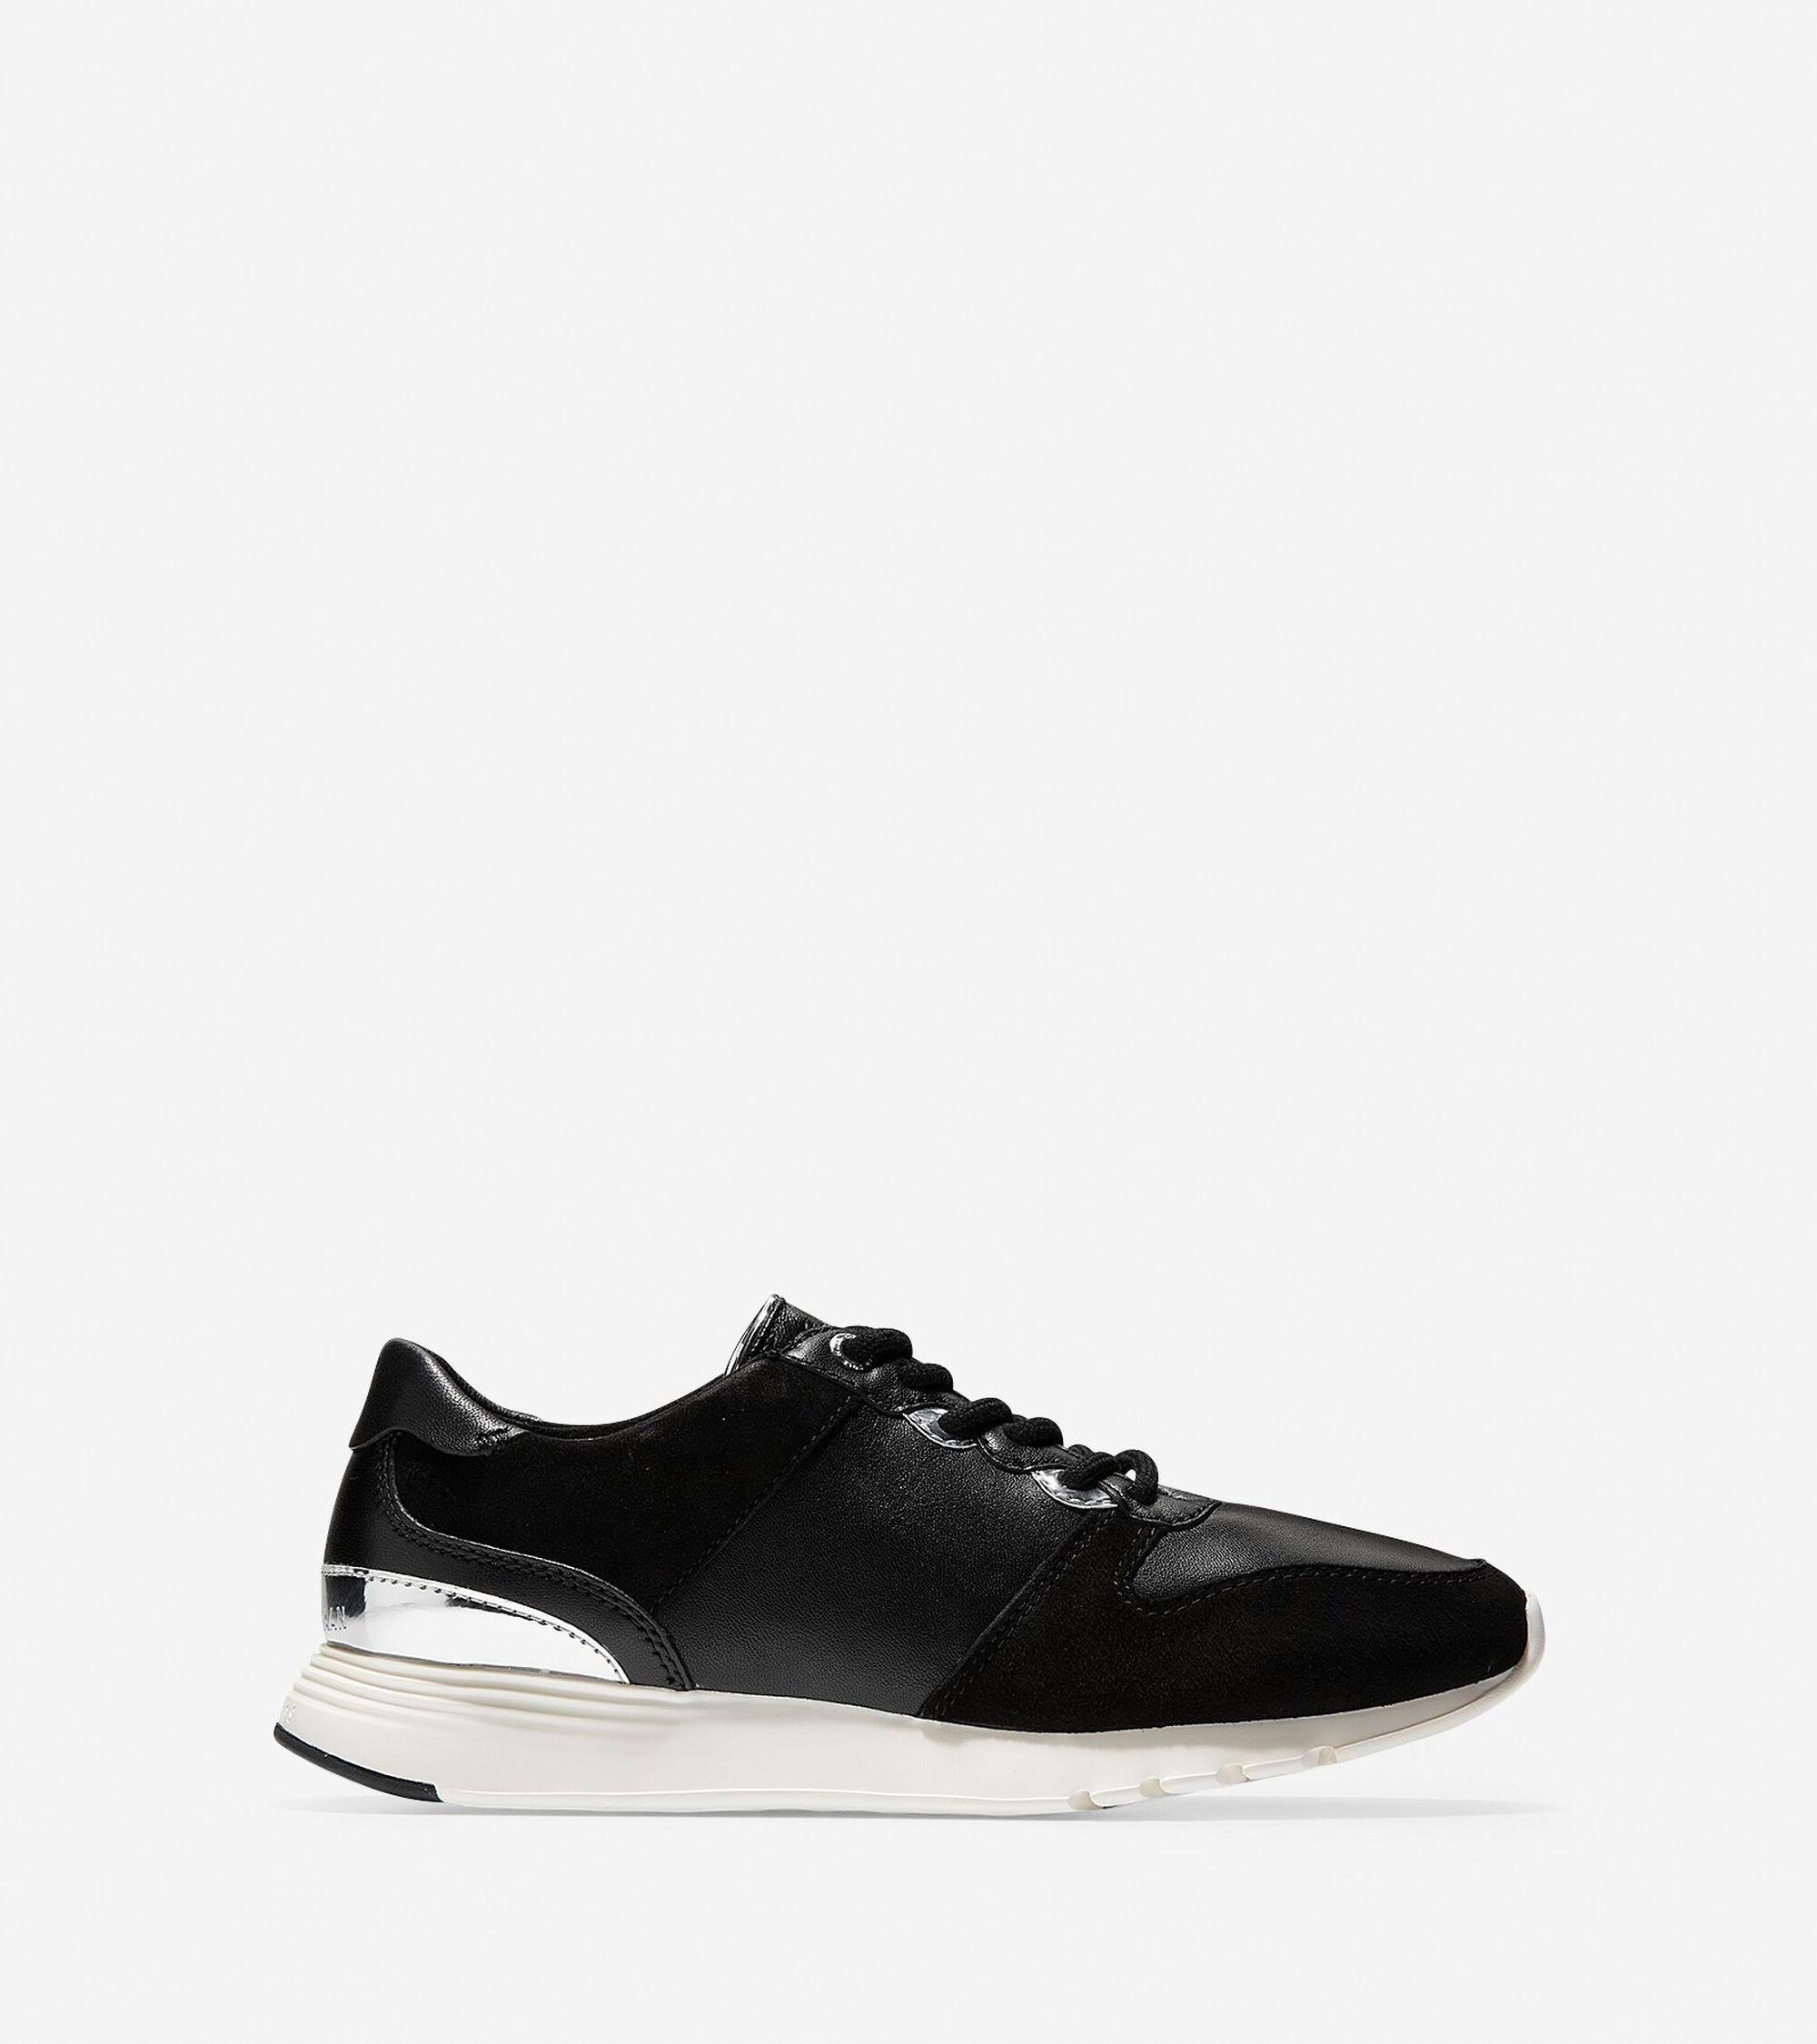 383fb2def3e7 Women s Grand Crosscourt Wedge Sneakers in Black-White